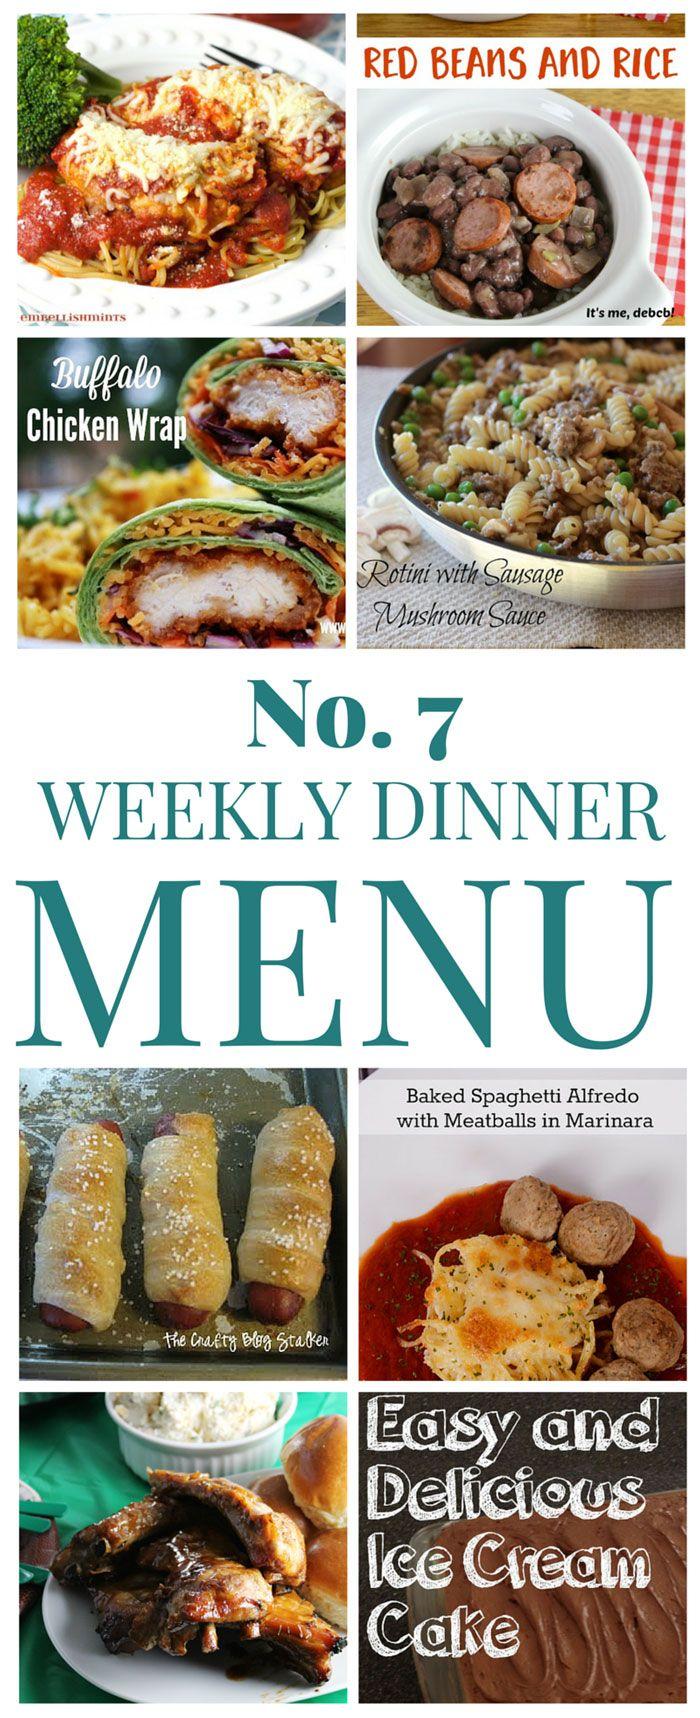 No more scrambling for dinner meal ideas! Weekly Dinner Menu #7